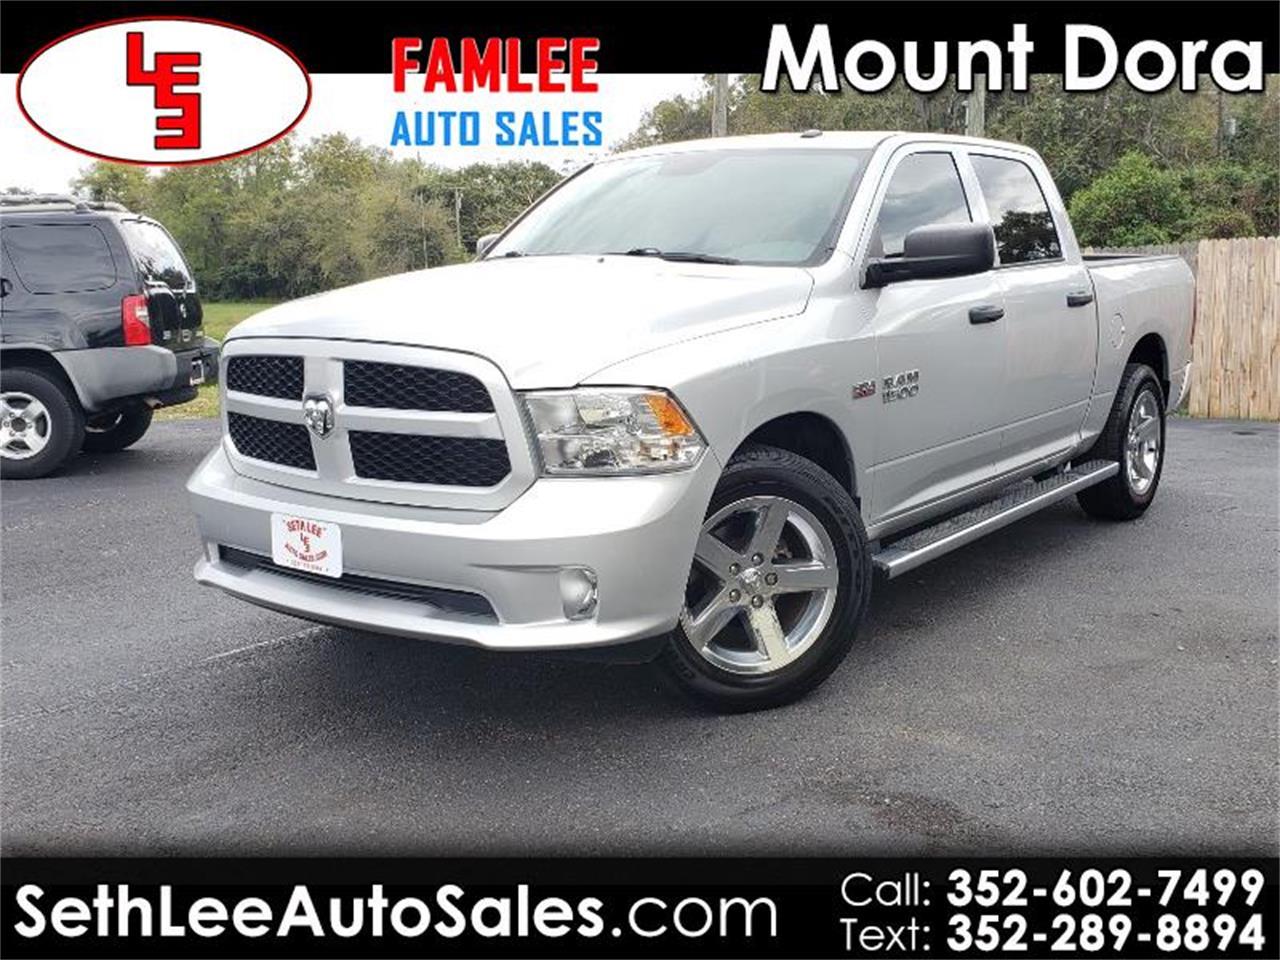 2016 Dodge Ram >> For Sale 2016 Dodge Ram 1500 In Tavares Florida